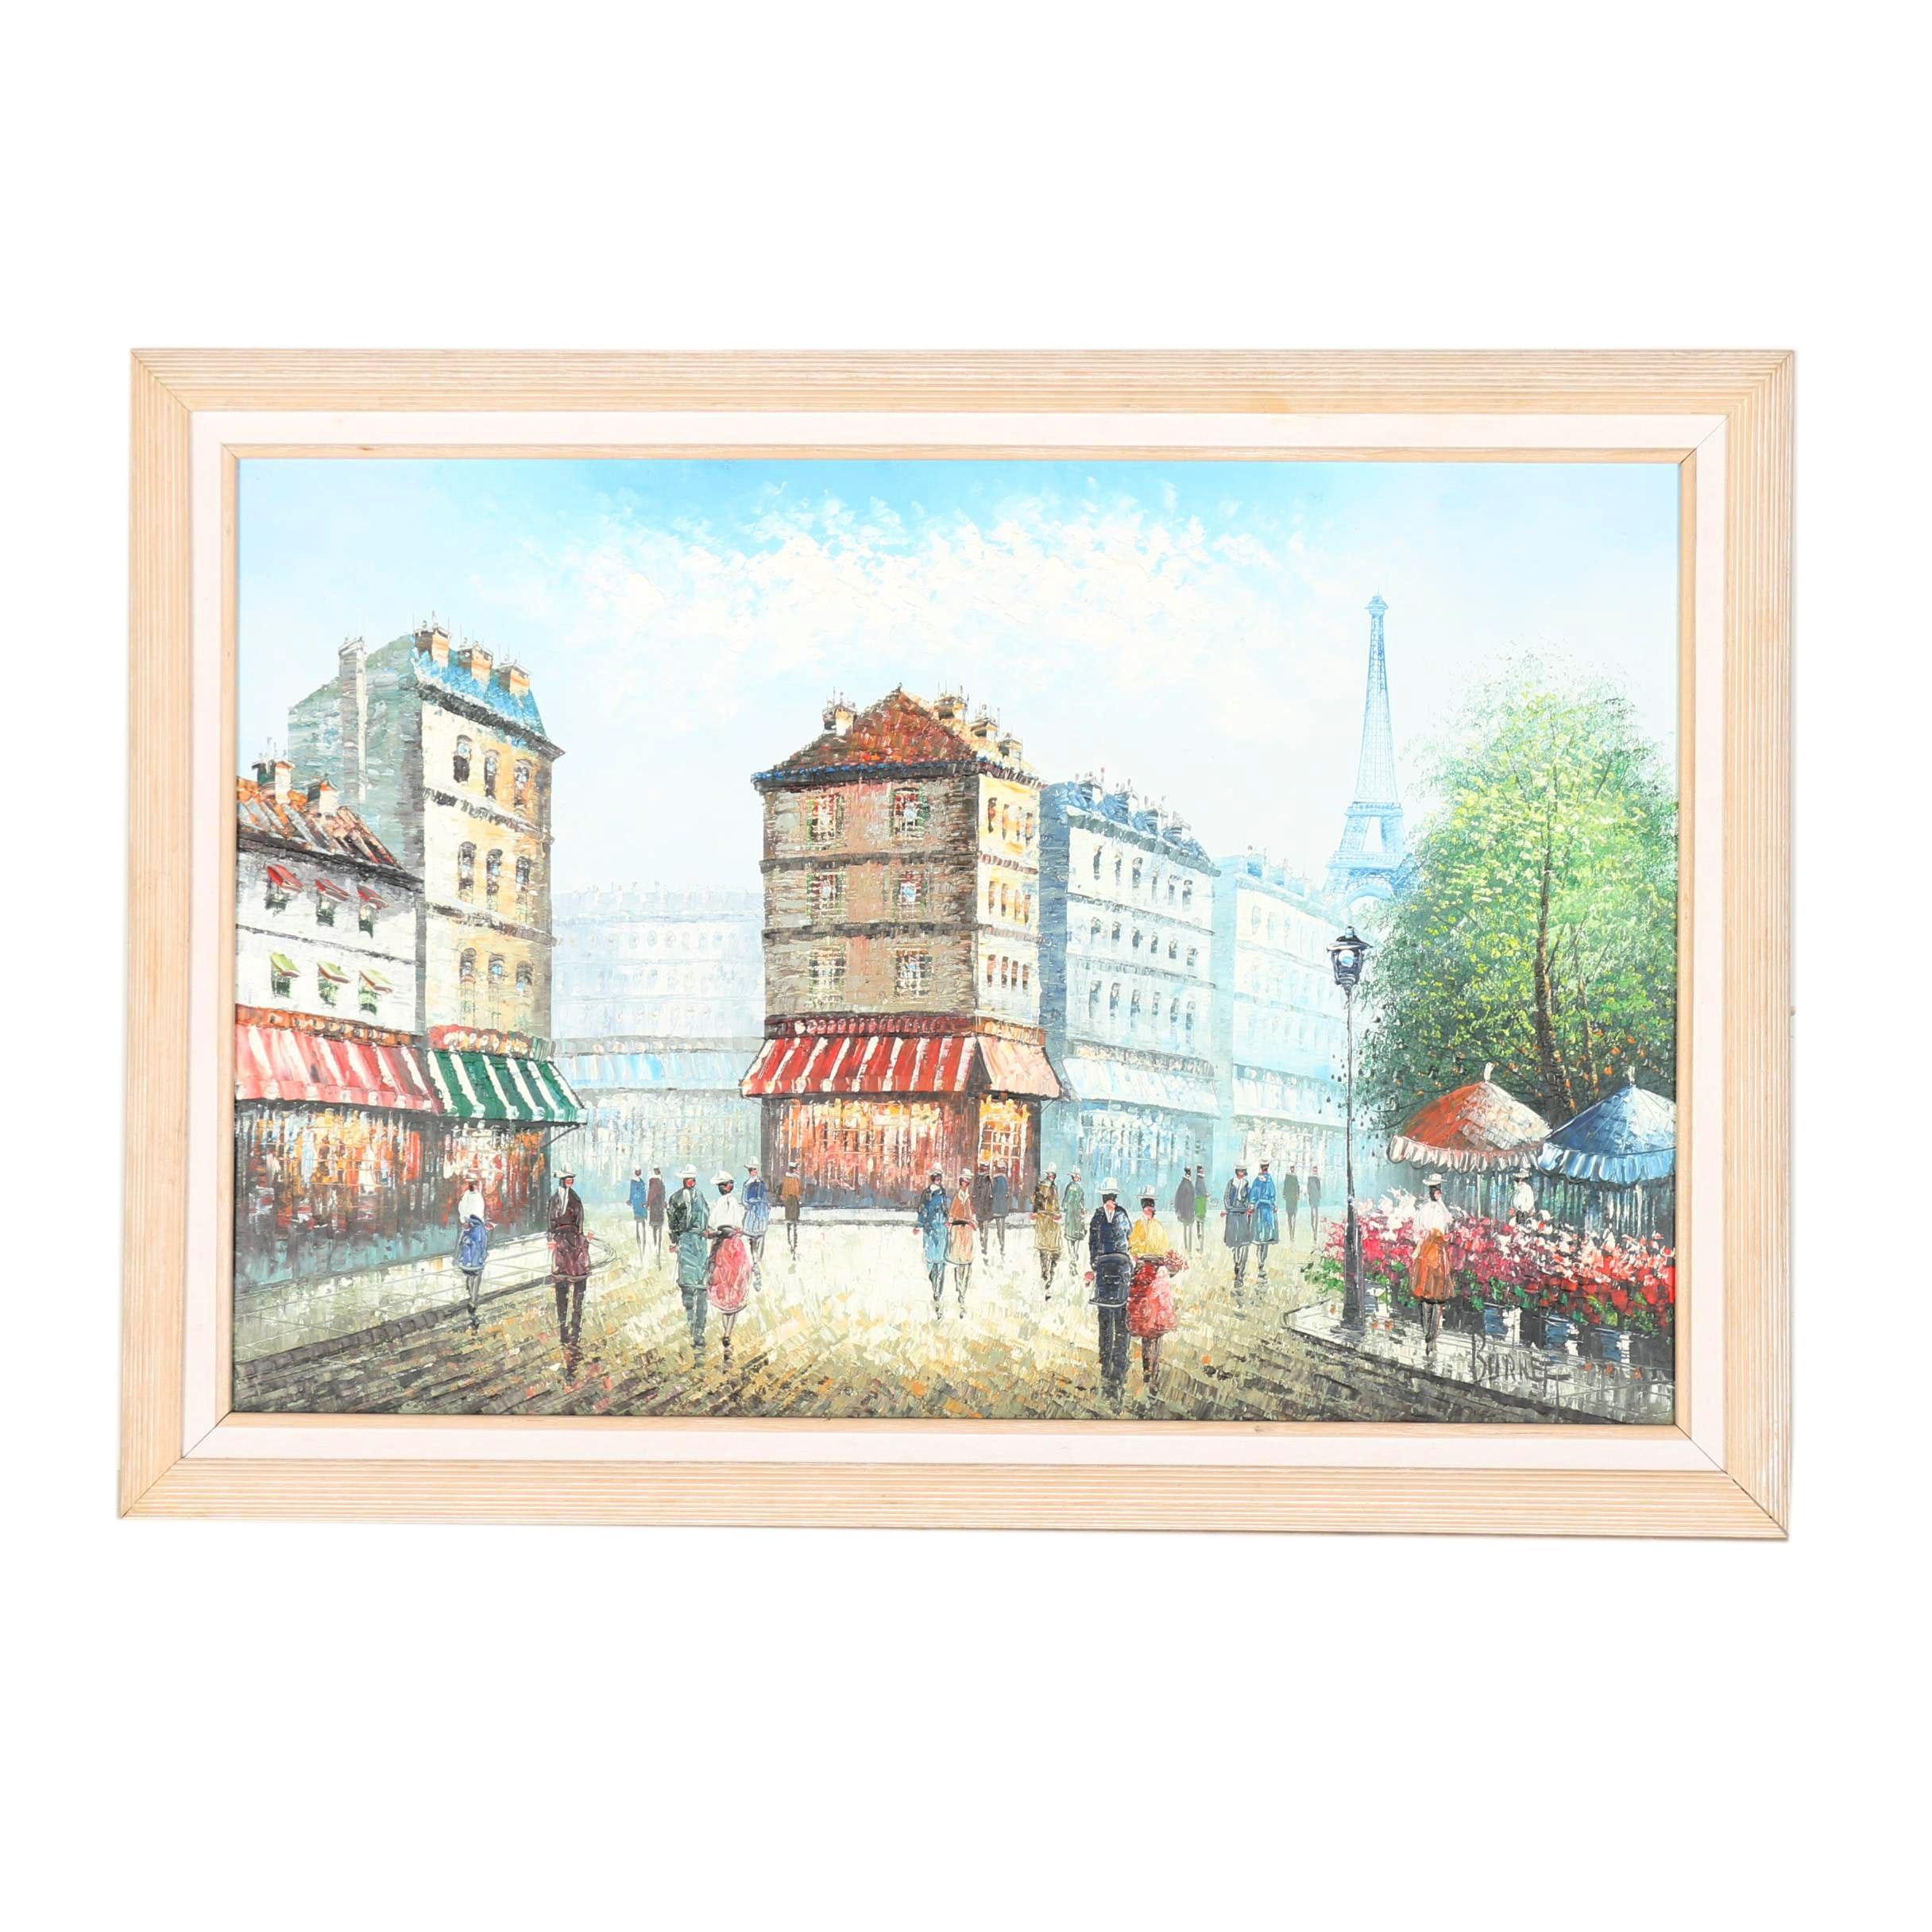 Burnett Oil Painting on Canvas of Parisian Street Scene